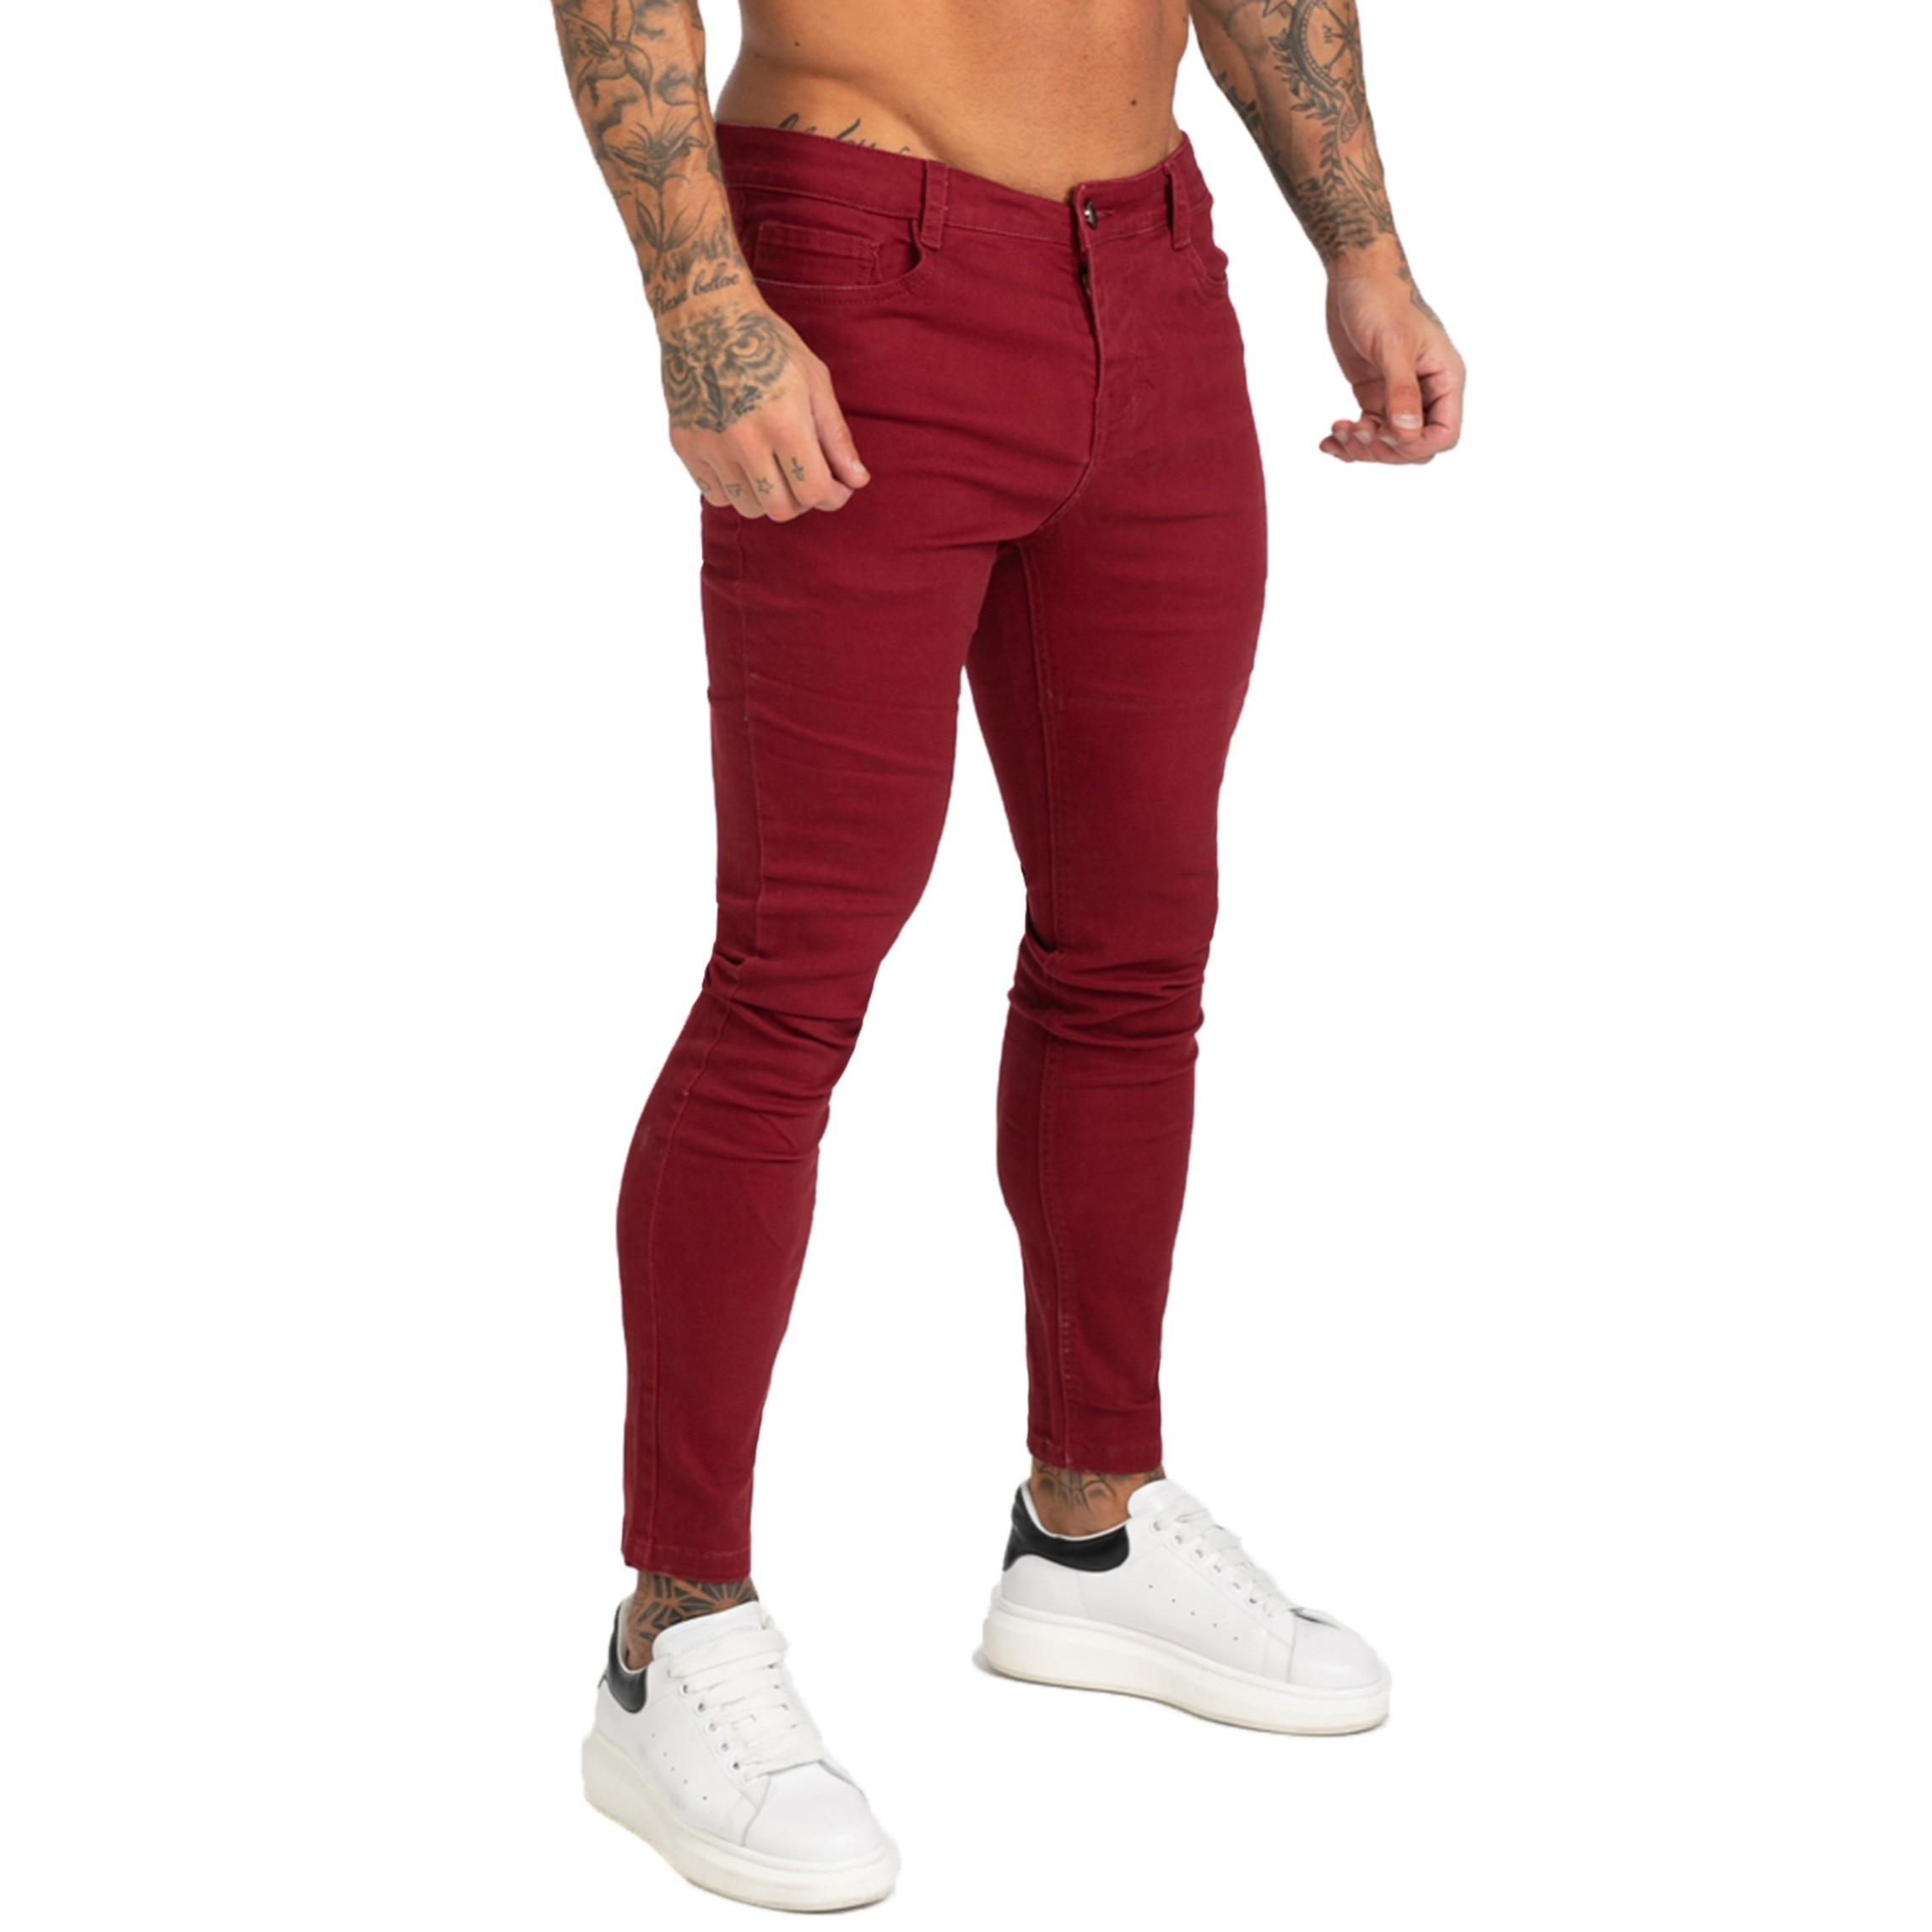 GINGTTO Jeans Men Calça Jeans Masculina Super Skinny Fit Mens Jeans Elastic Waist Bestting For Athletic Body Hip Hop Zm173